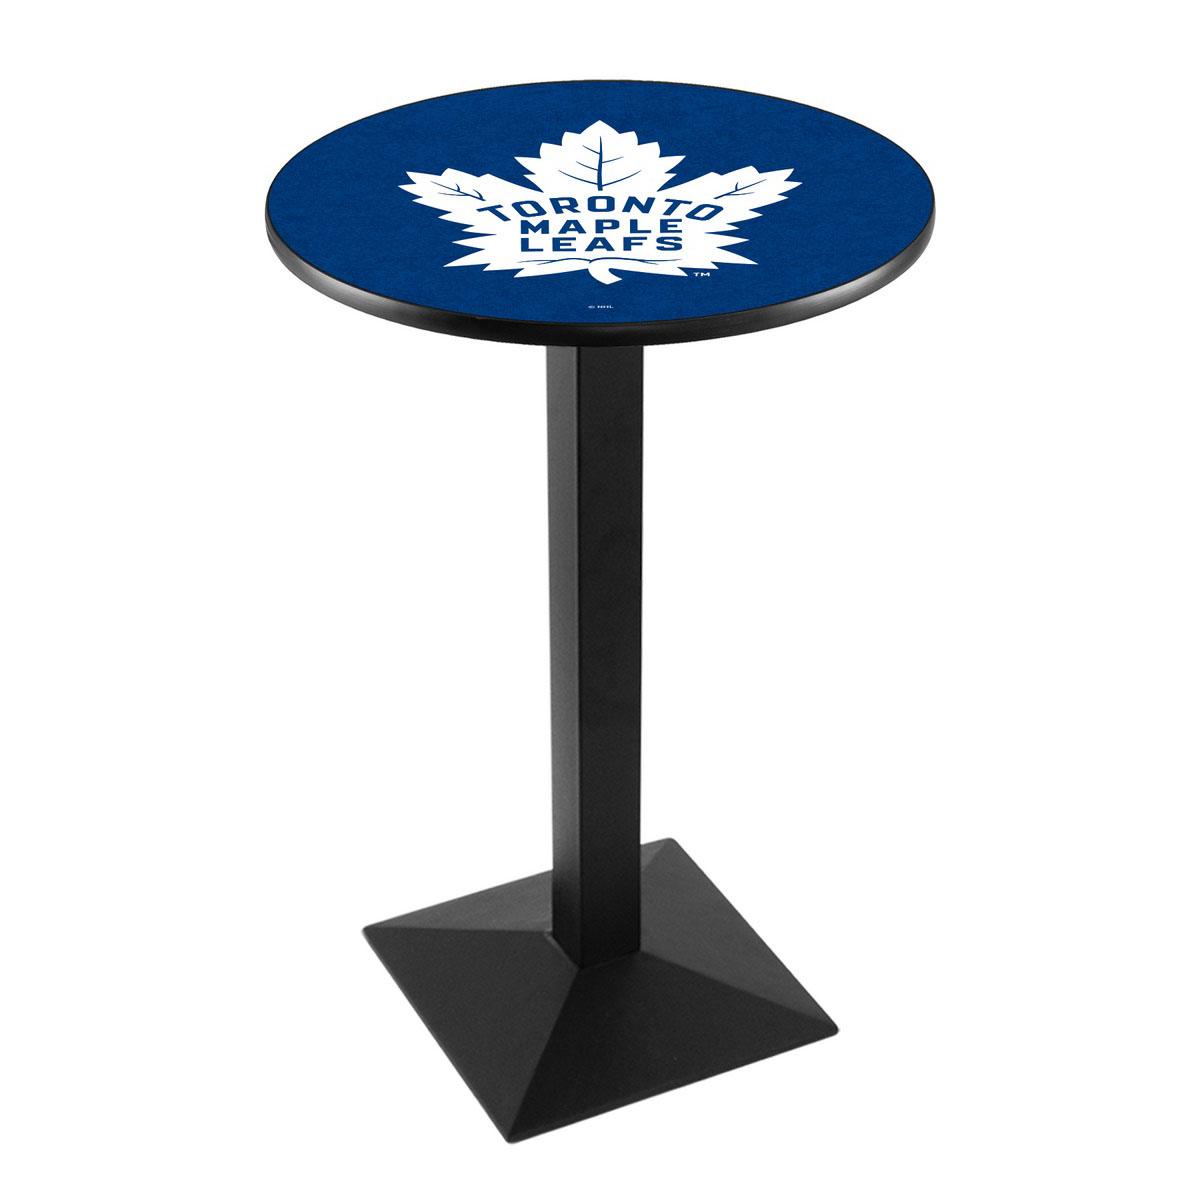 Tasteful Toronto Leafs Logo Pub Bar Table Square Stand Product Photo